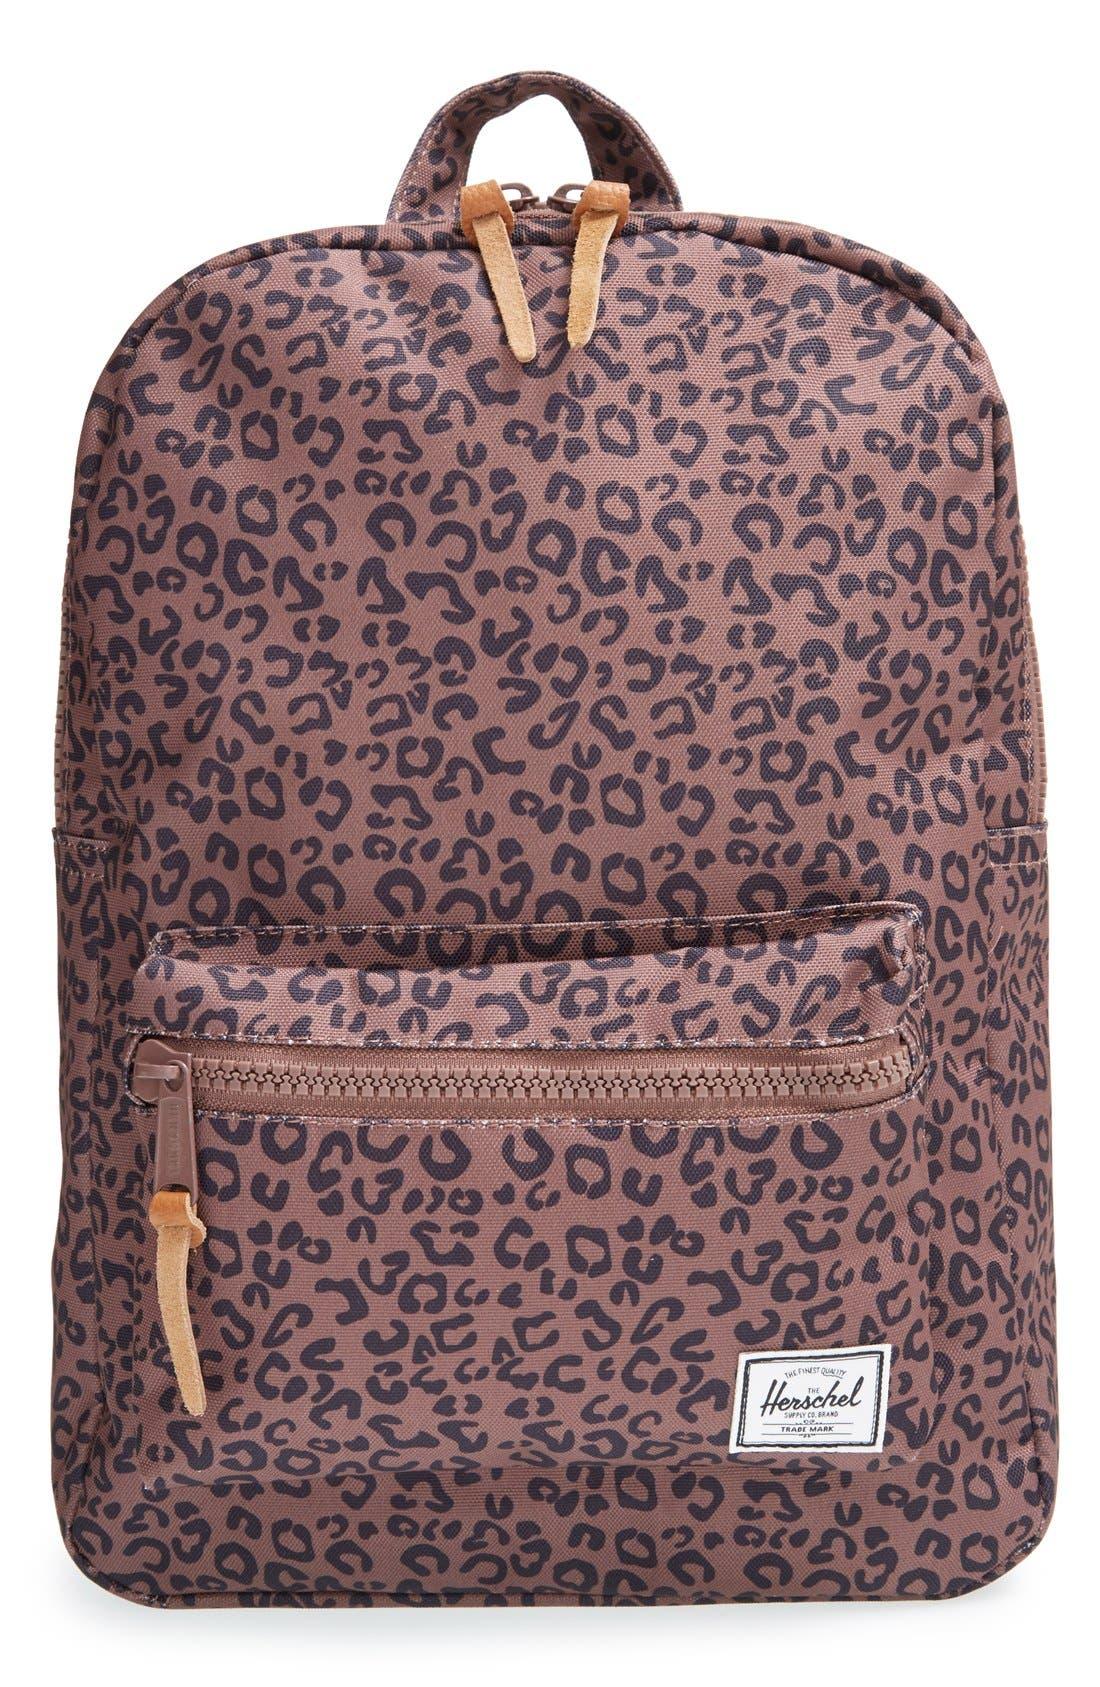 'Settlement - Leopard Print' Backpack,                             Main thumbnail 1, color,                             001